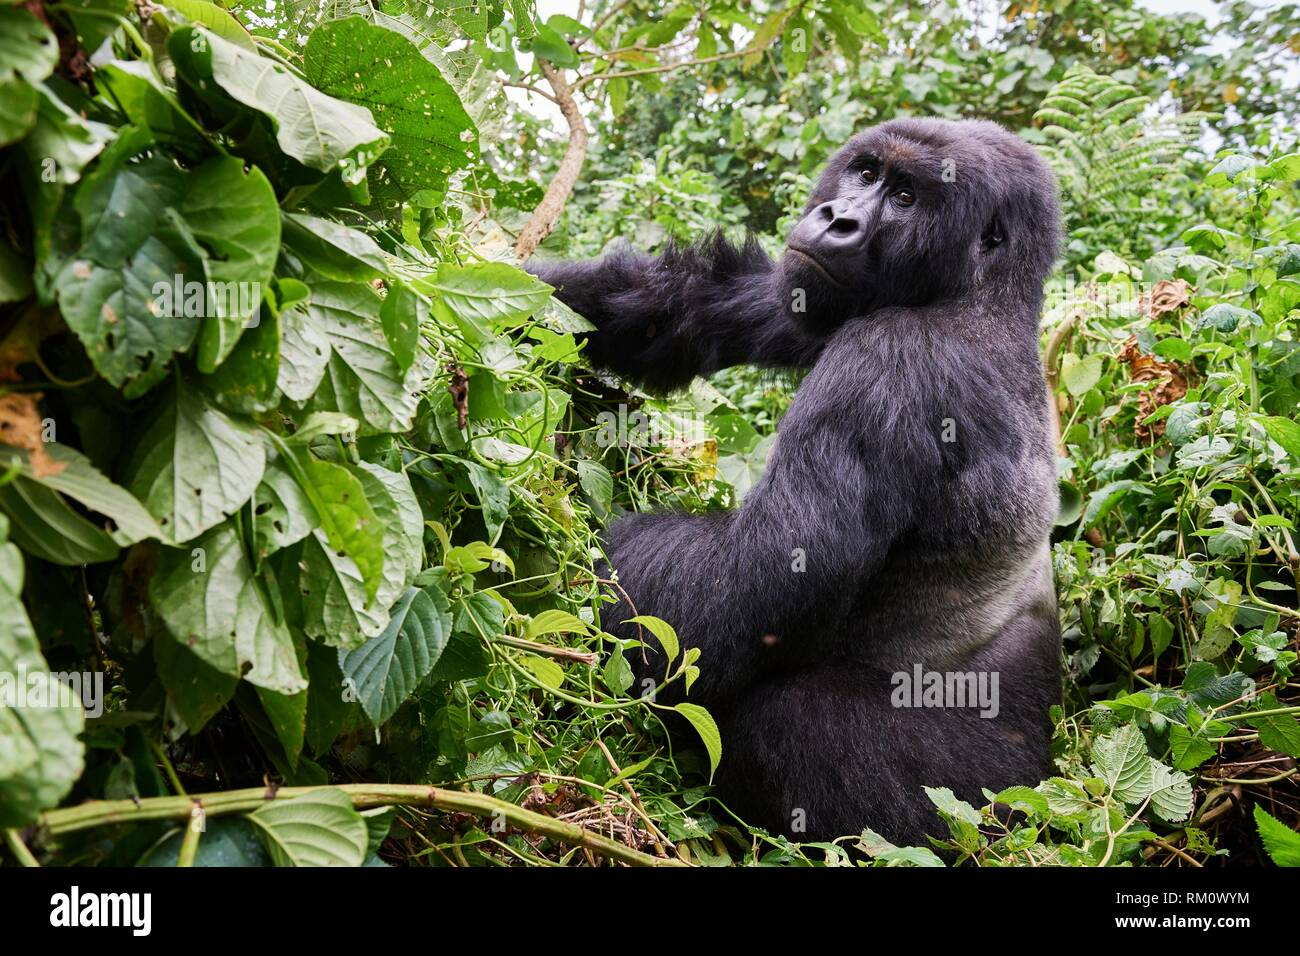 Silverback Mountain gorilla (Gorilla beringei beringei) member of Kabirizi group. Virunga National Park, North Kivu, Democratic Republic of Congo, - Stock Image